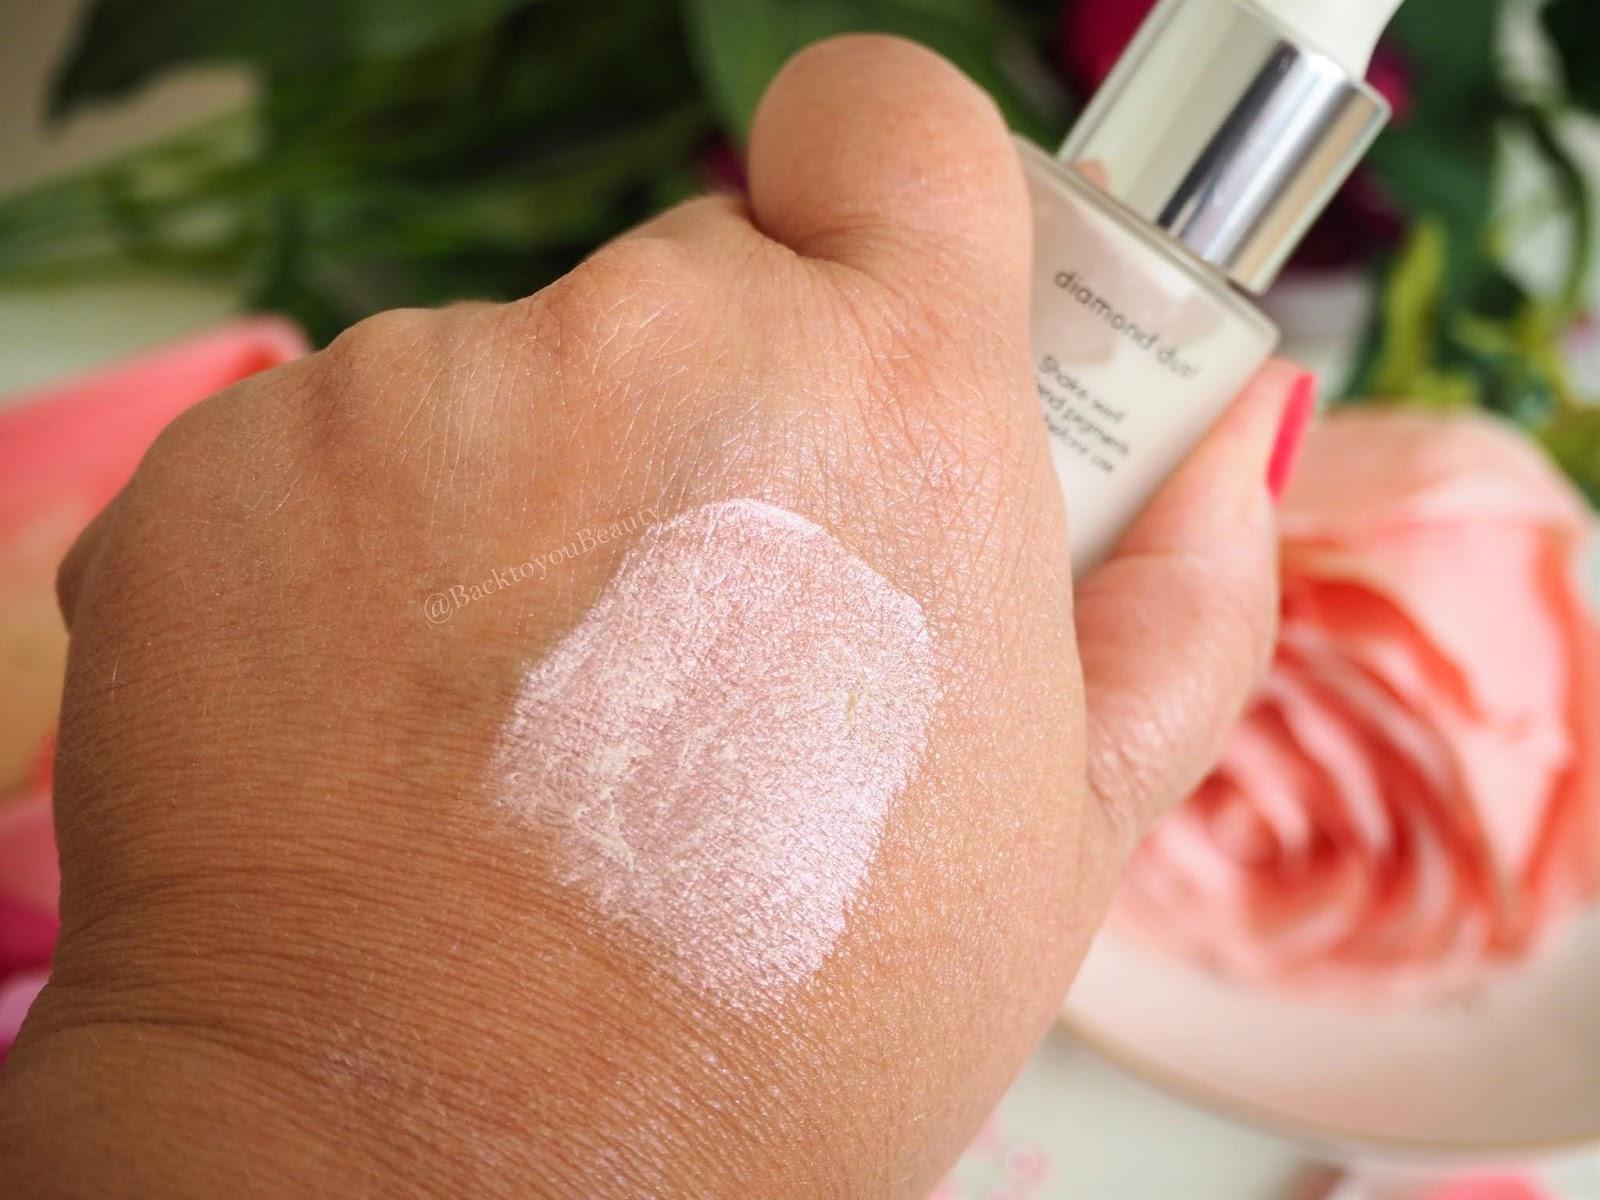 Laura Geller Diamond Dust Illuminating Highlighter Swatch